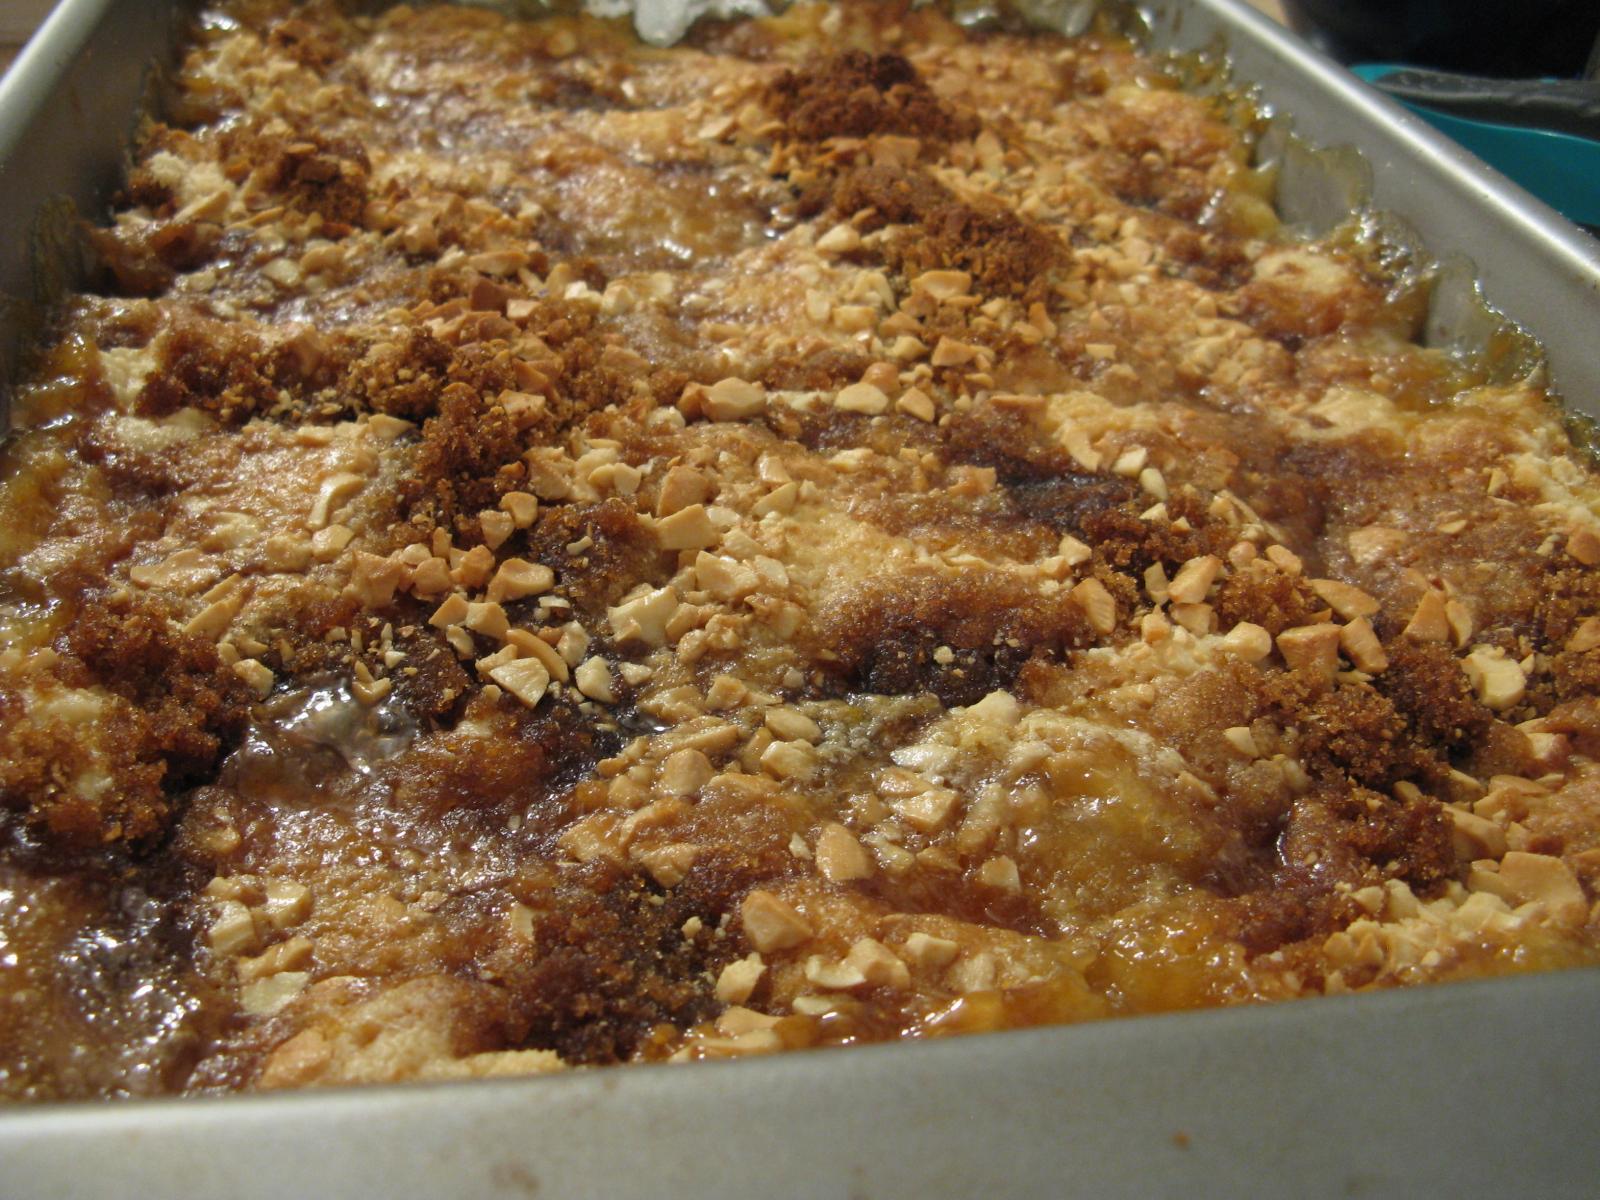 Blueberry Dump Cake With Crushged Pineapple Recipe